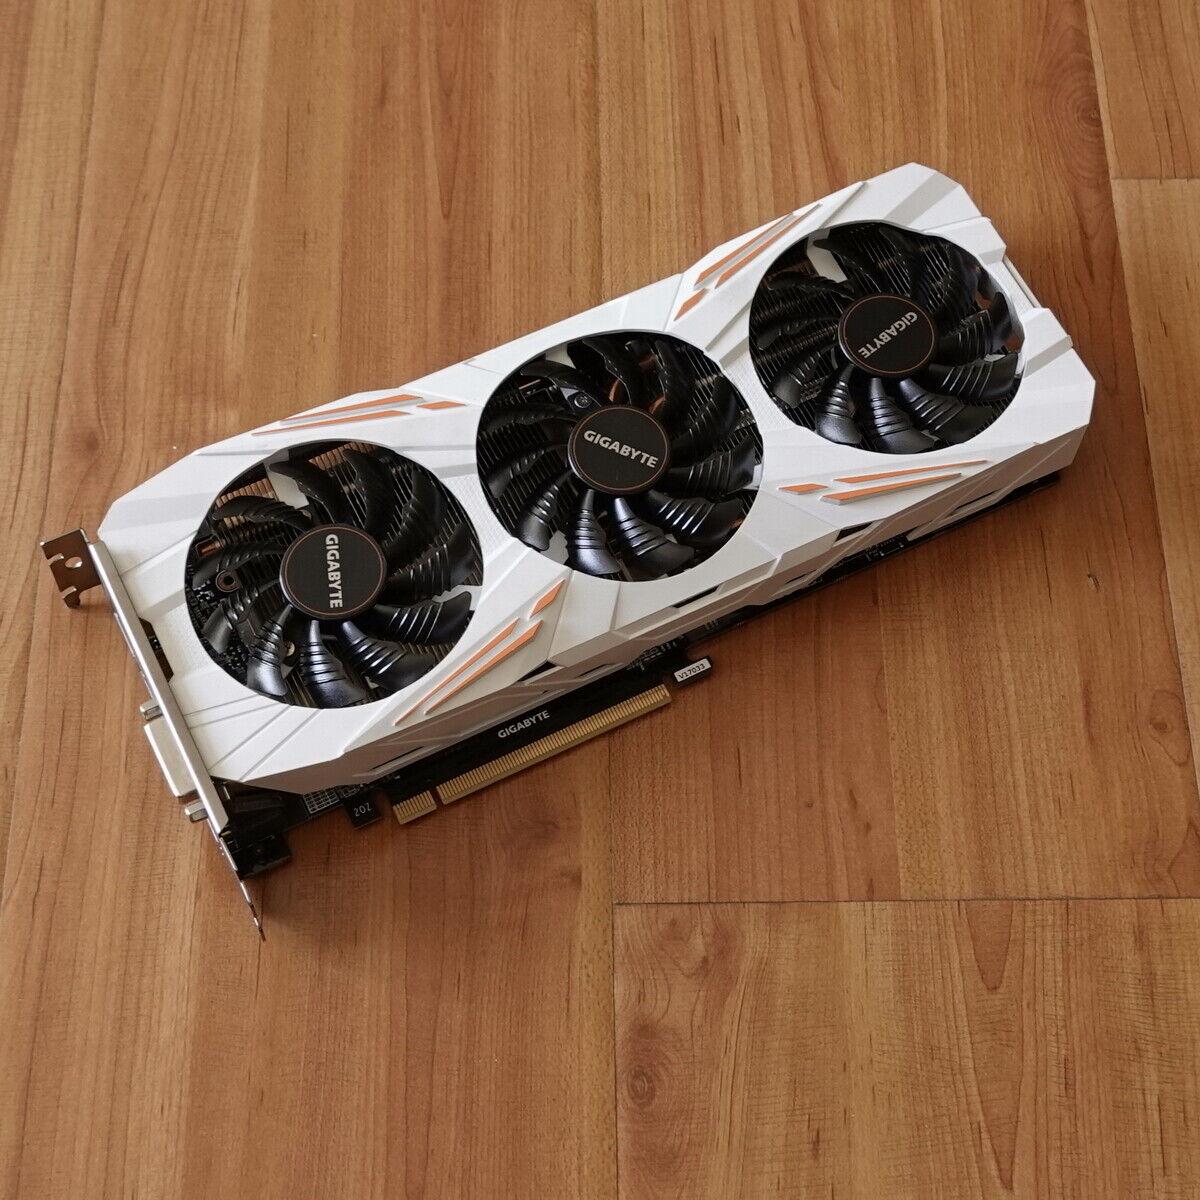 Gigabyte GTX 1080 Ti Gaming OC 11G WINDFORCE 11GB Graphics Card GPU Nvidia